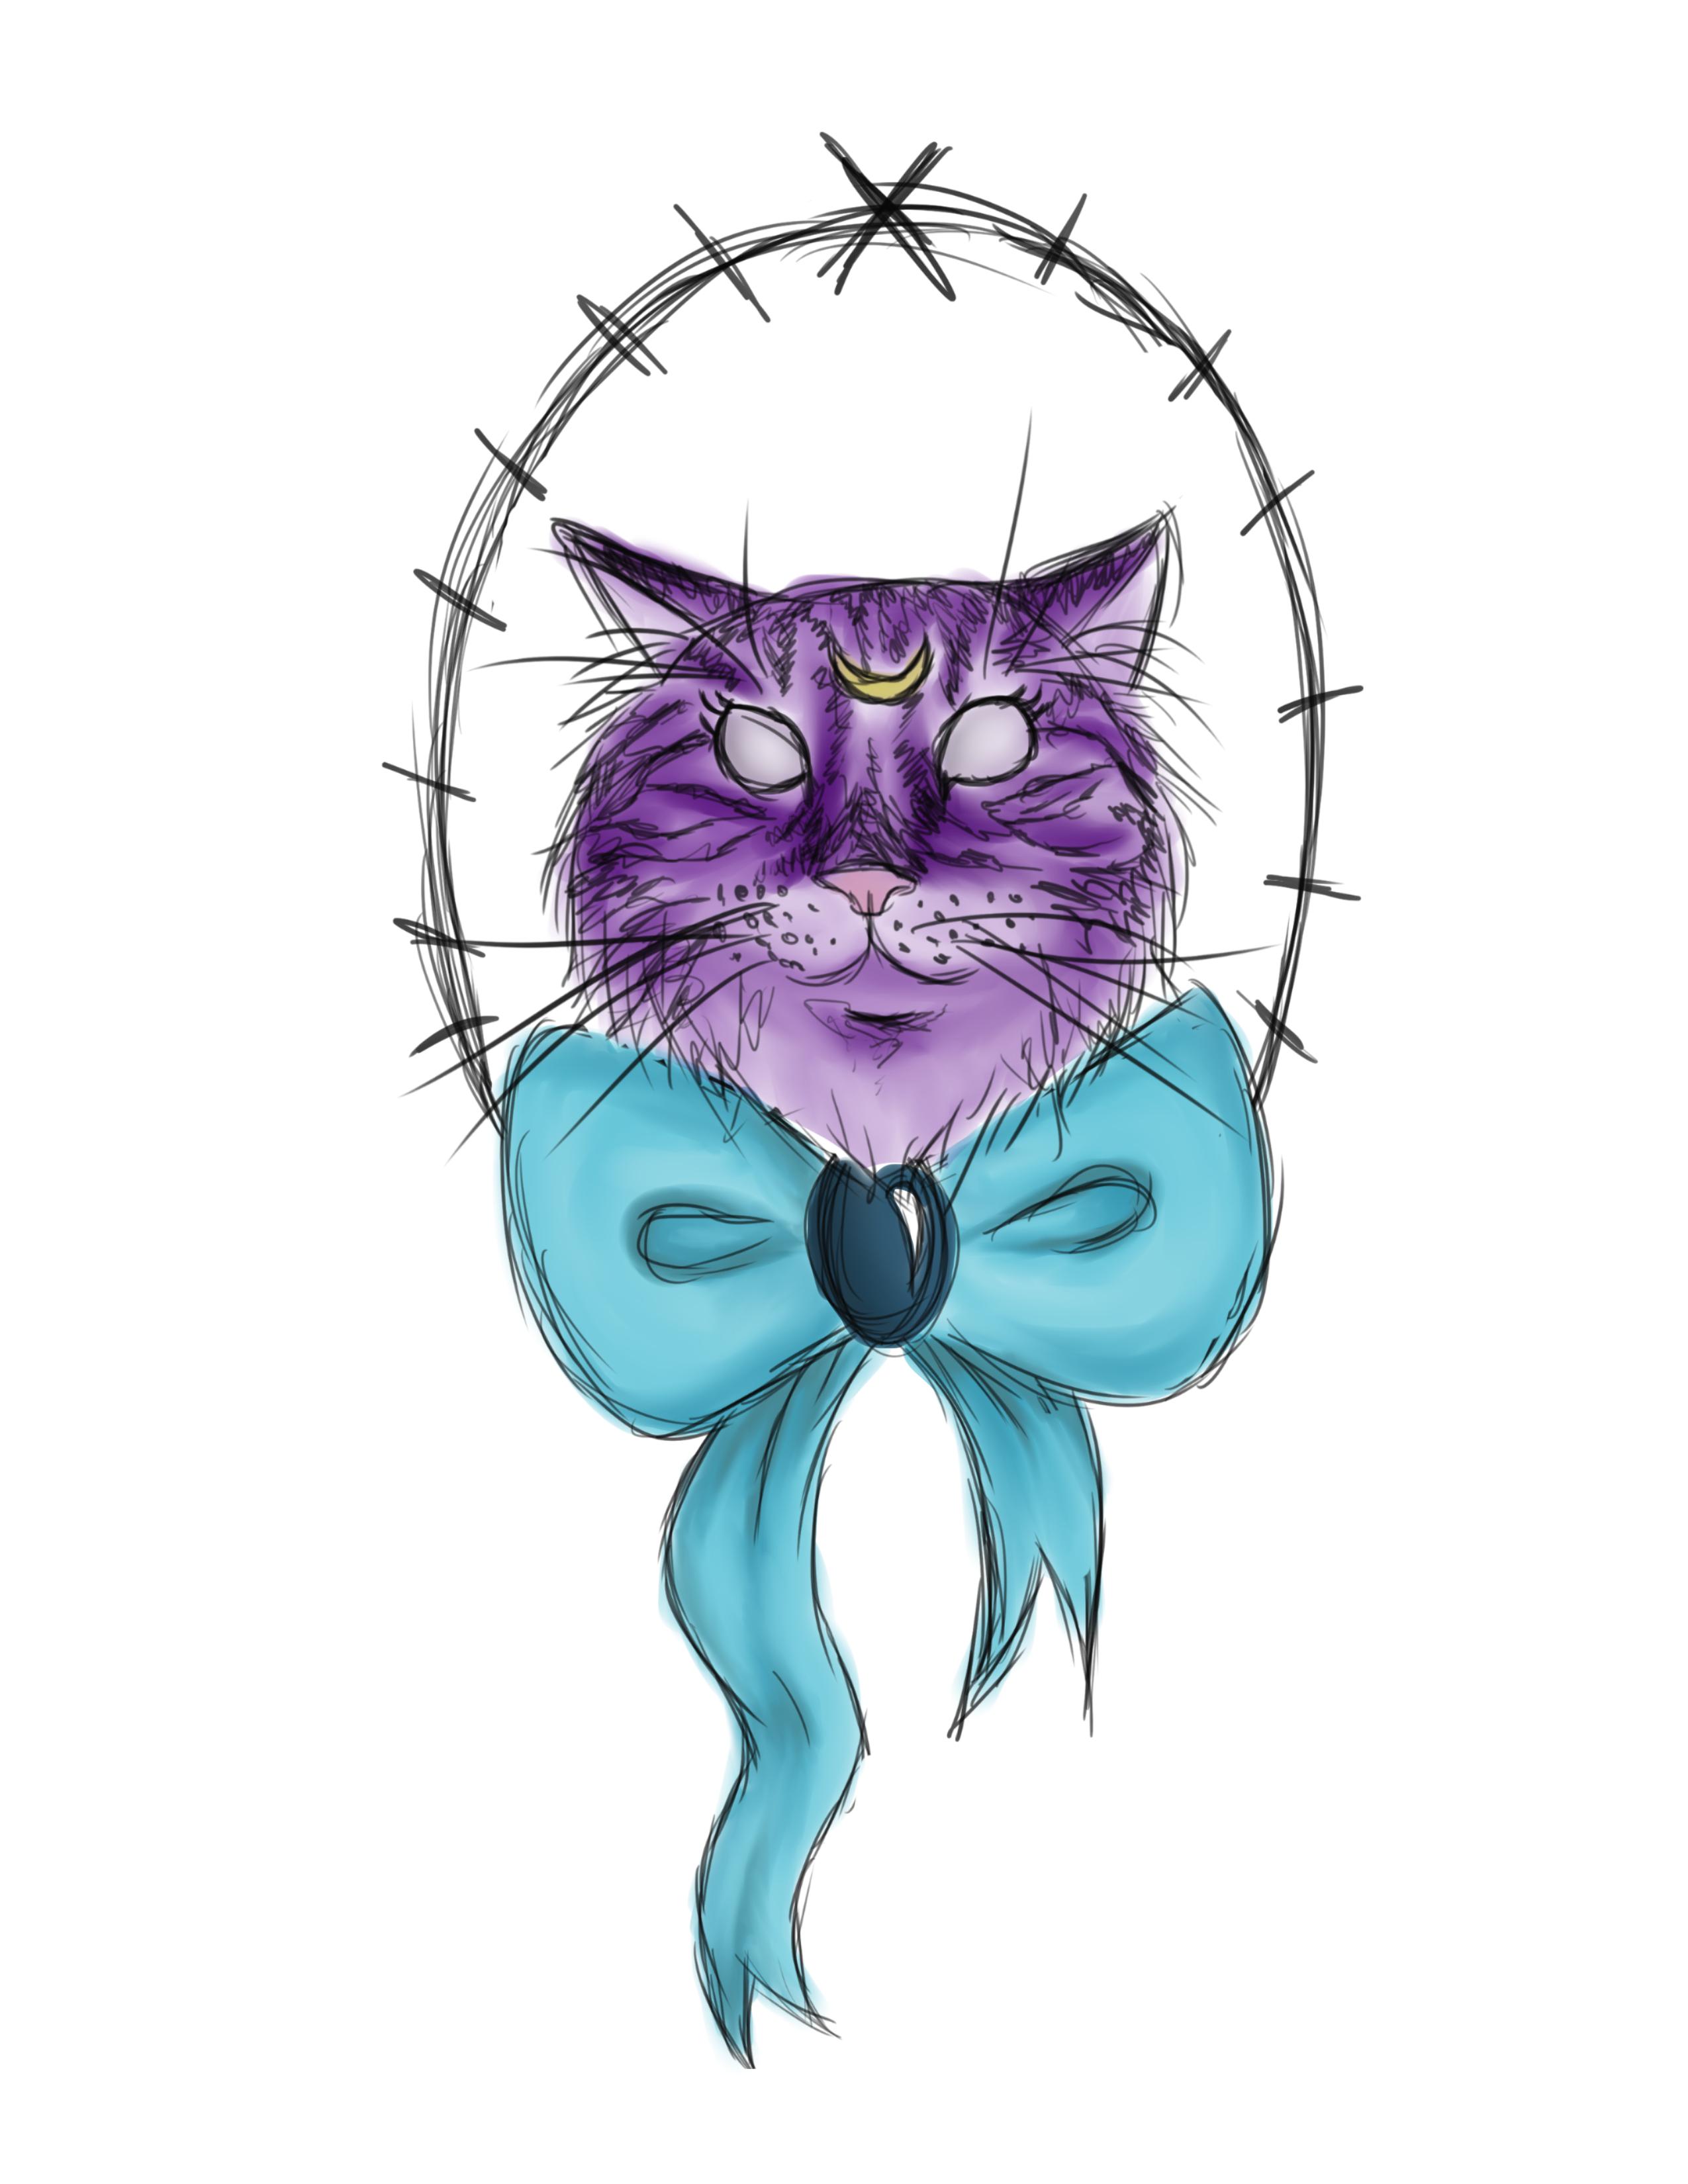 Tattoo design of Luna from Sailor Moon